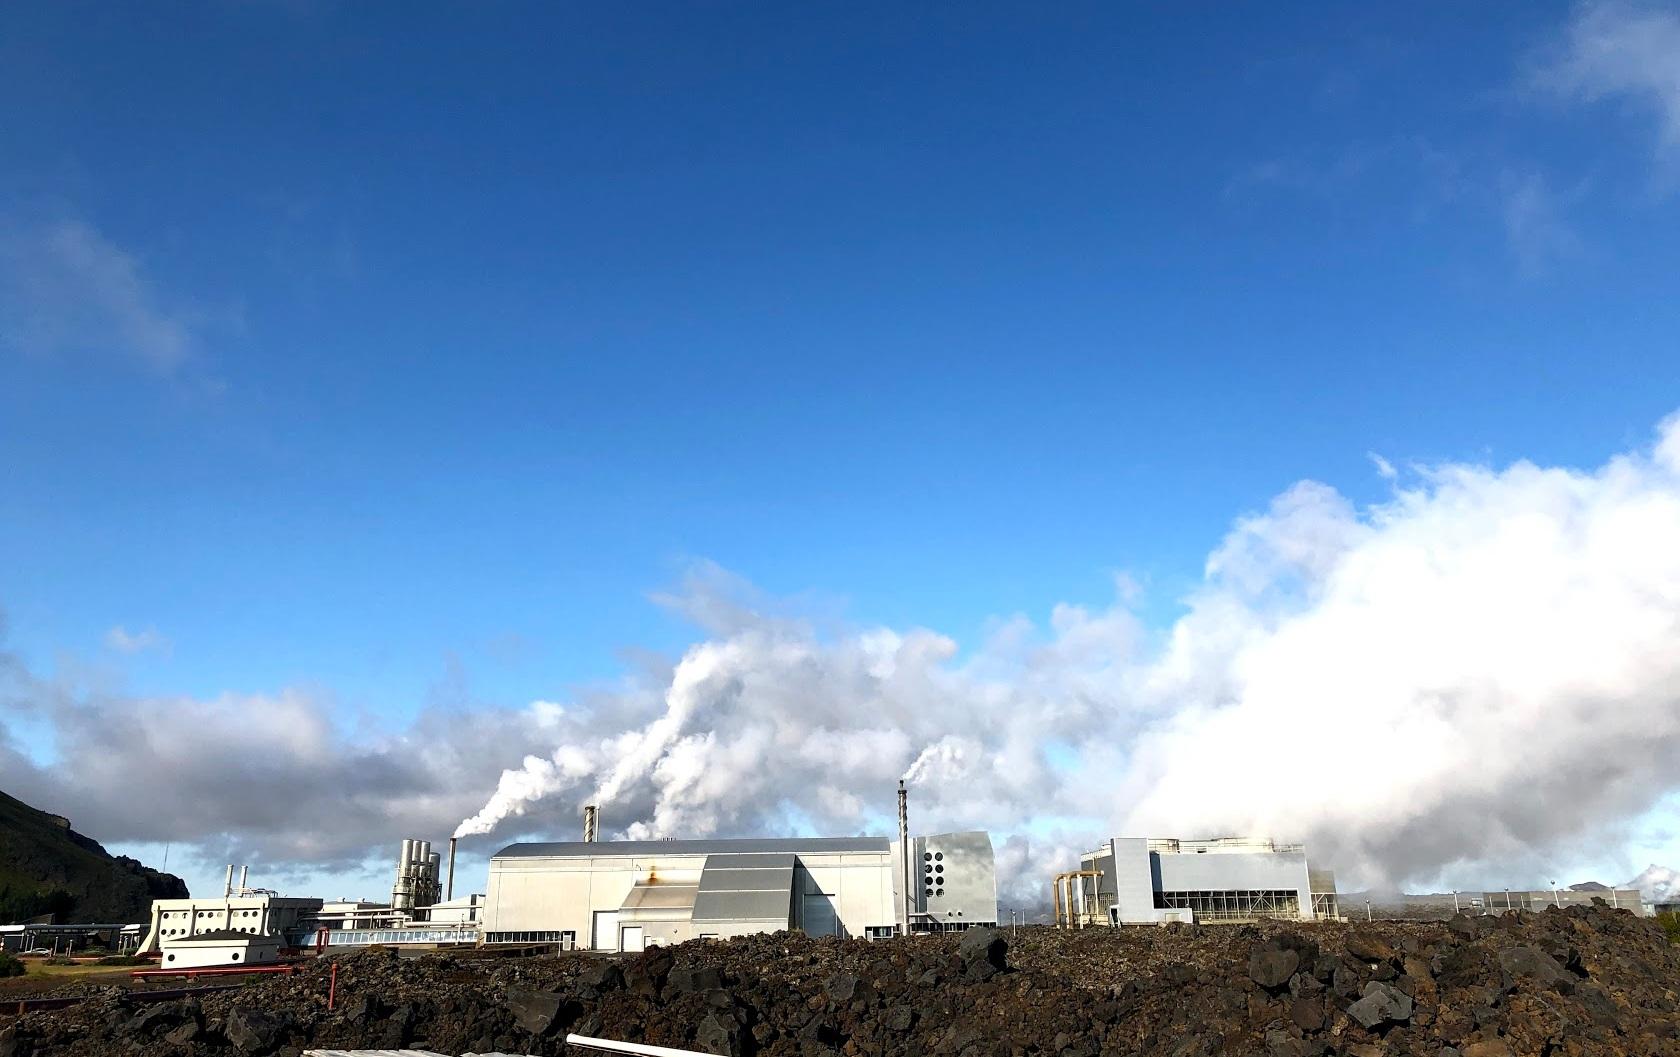 Iceland's Blue Lagoon backdrop:  Svartsengi geothermal plant